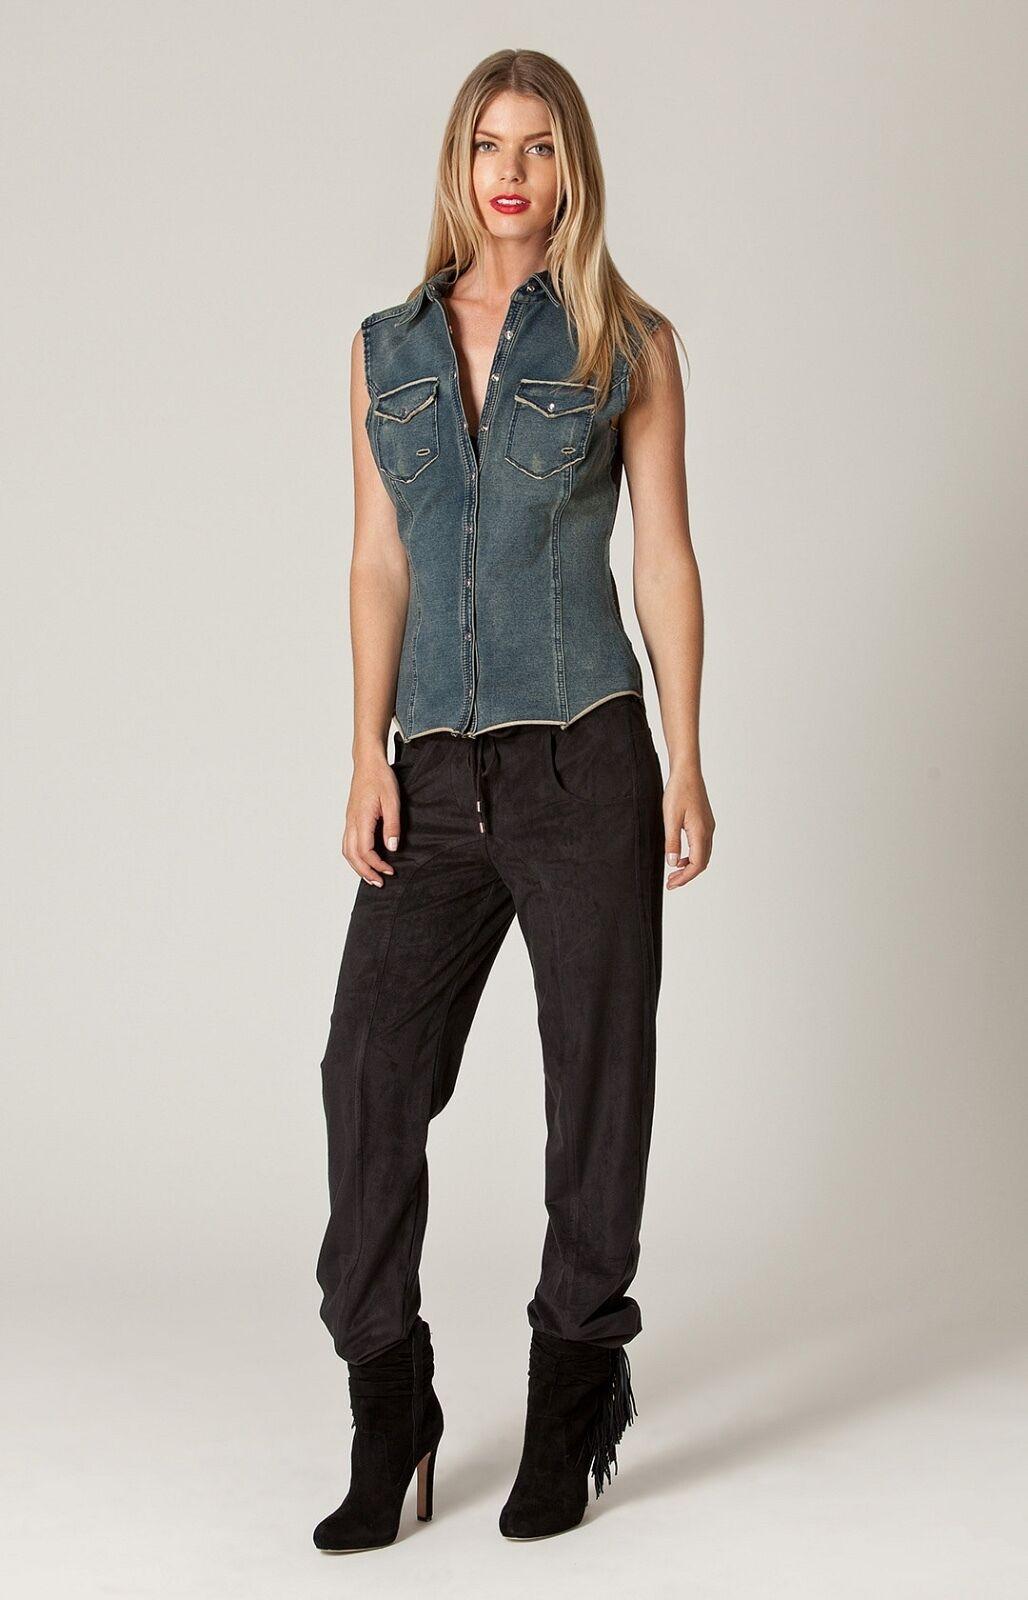 Liberty Garden Sleeveless Denim Shirt   Button Down   Leather XS NWT 5WES2705